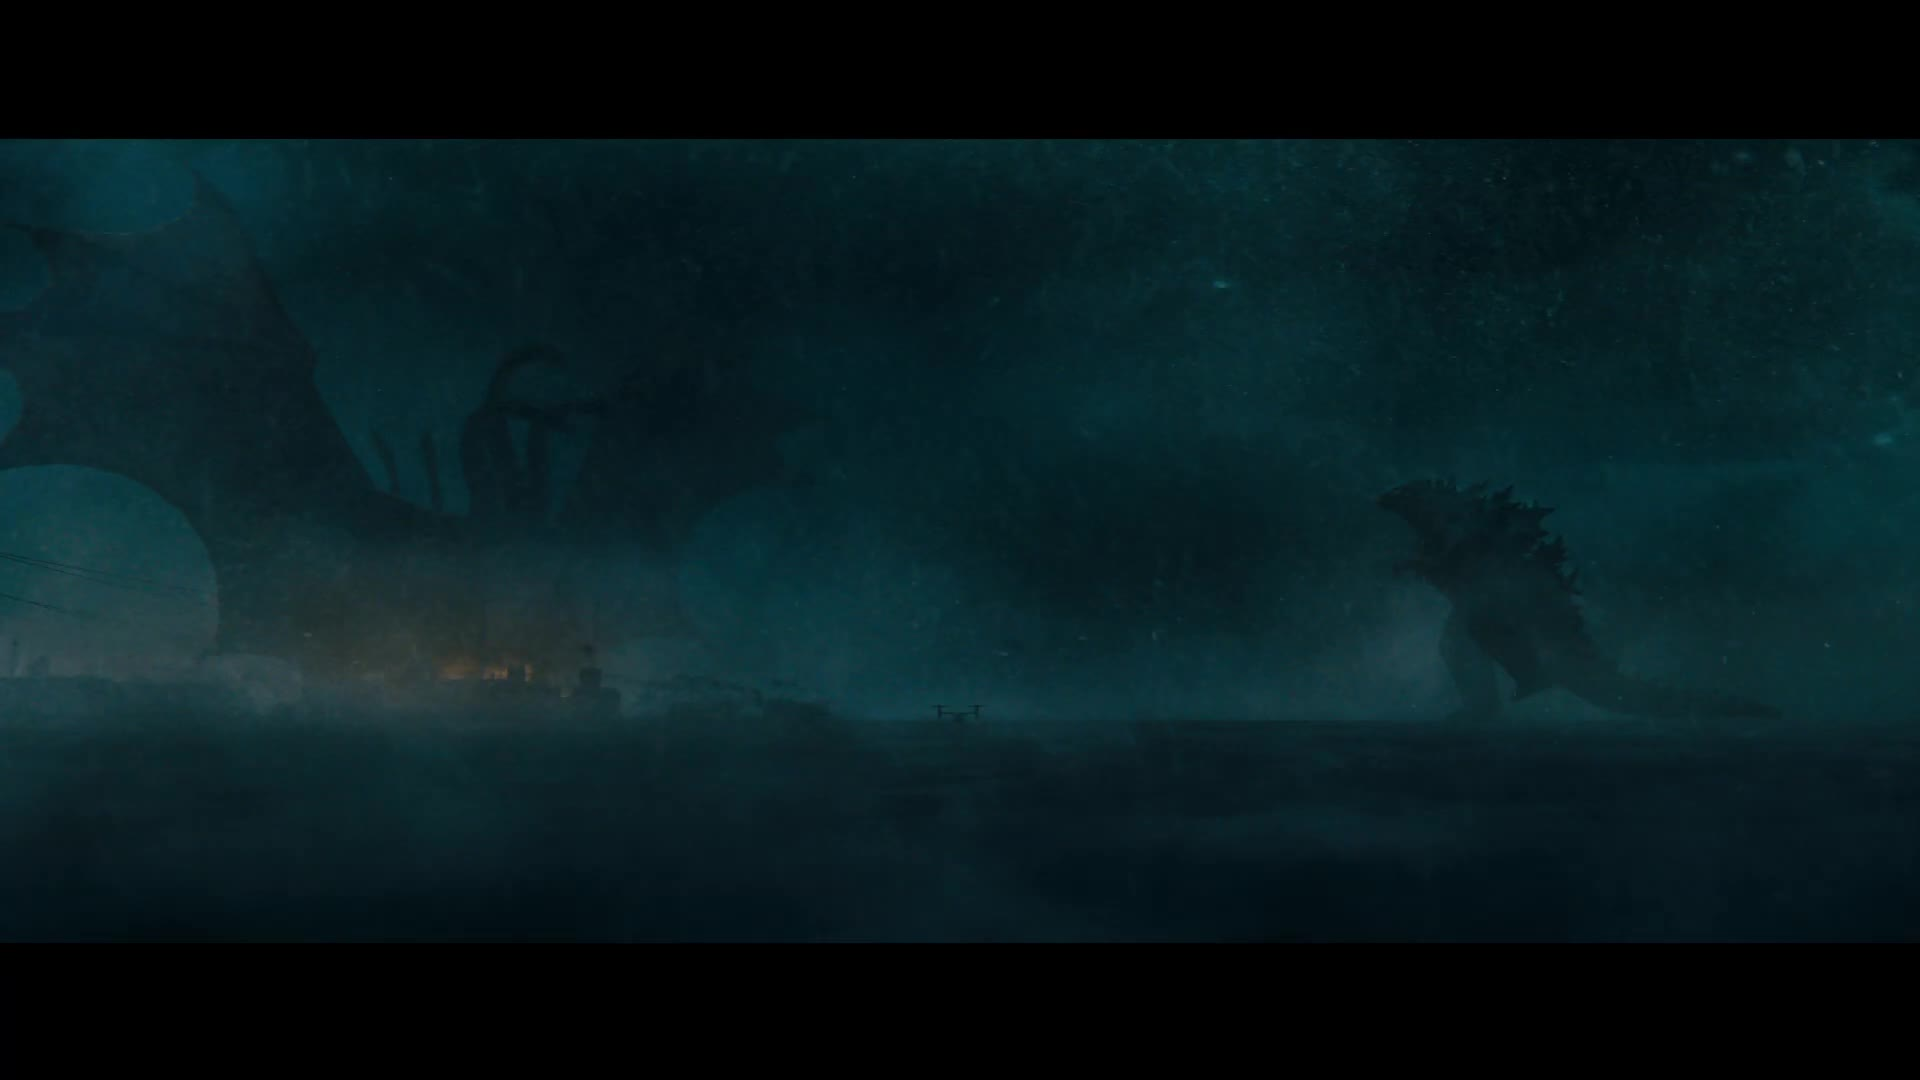 Godzilla King Of The Monsters Gif By Uwu Gfycat